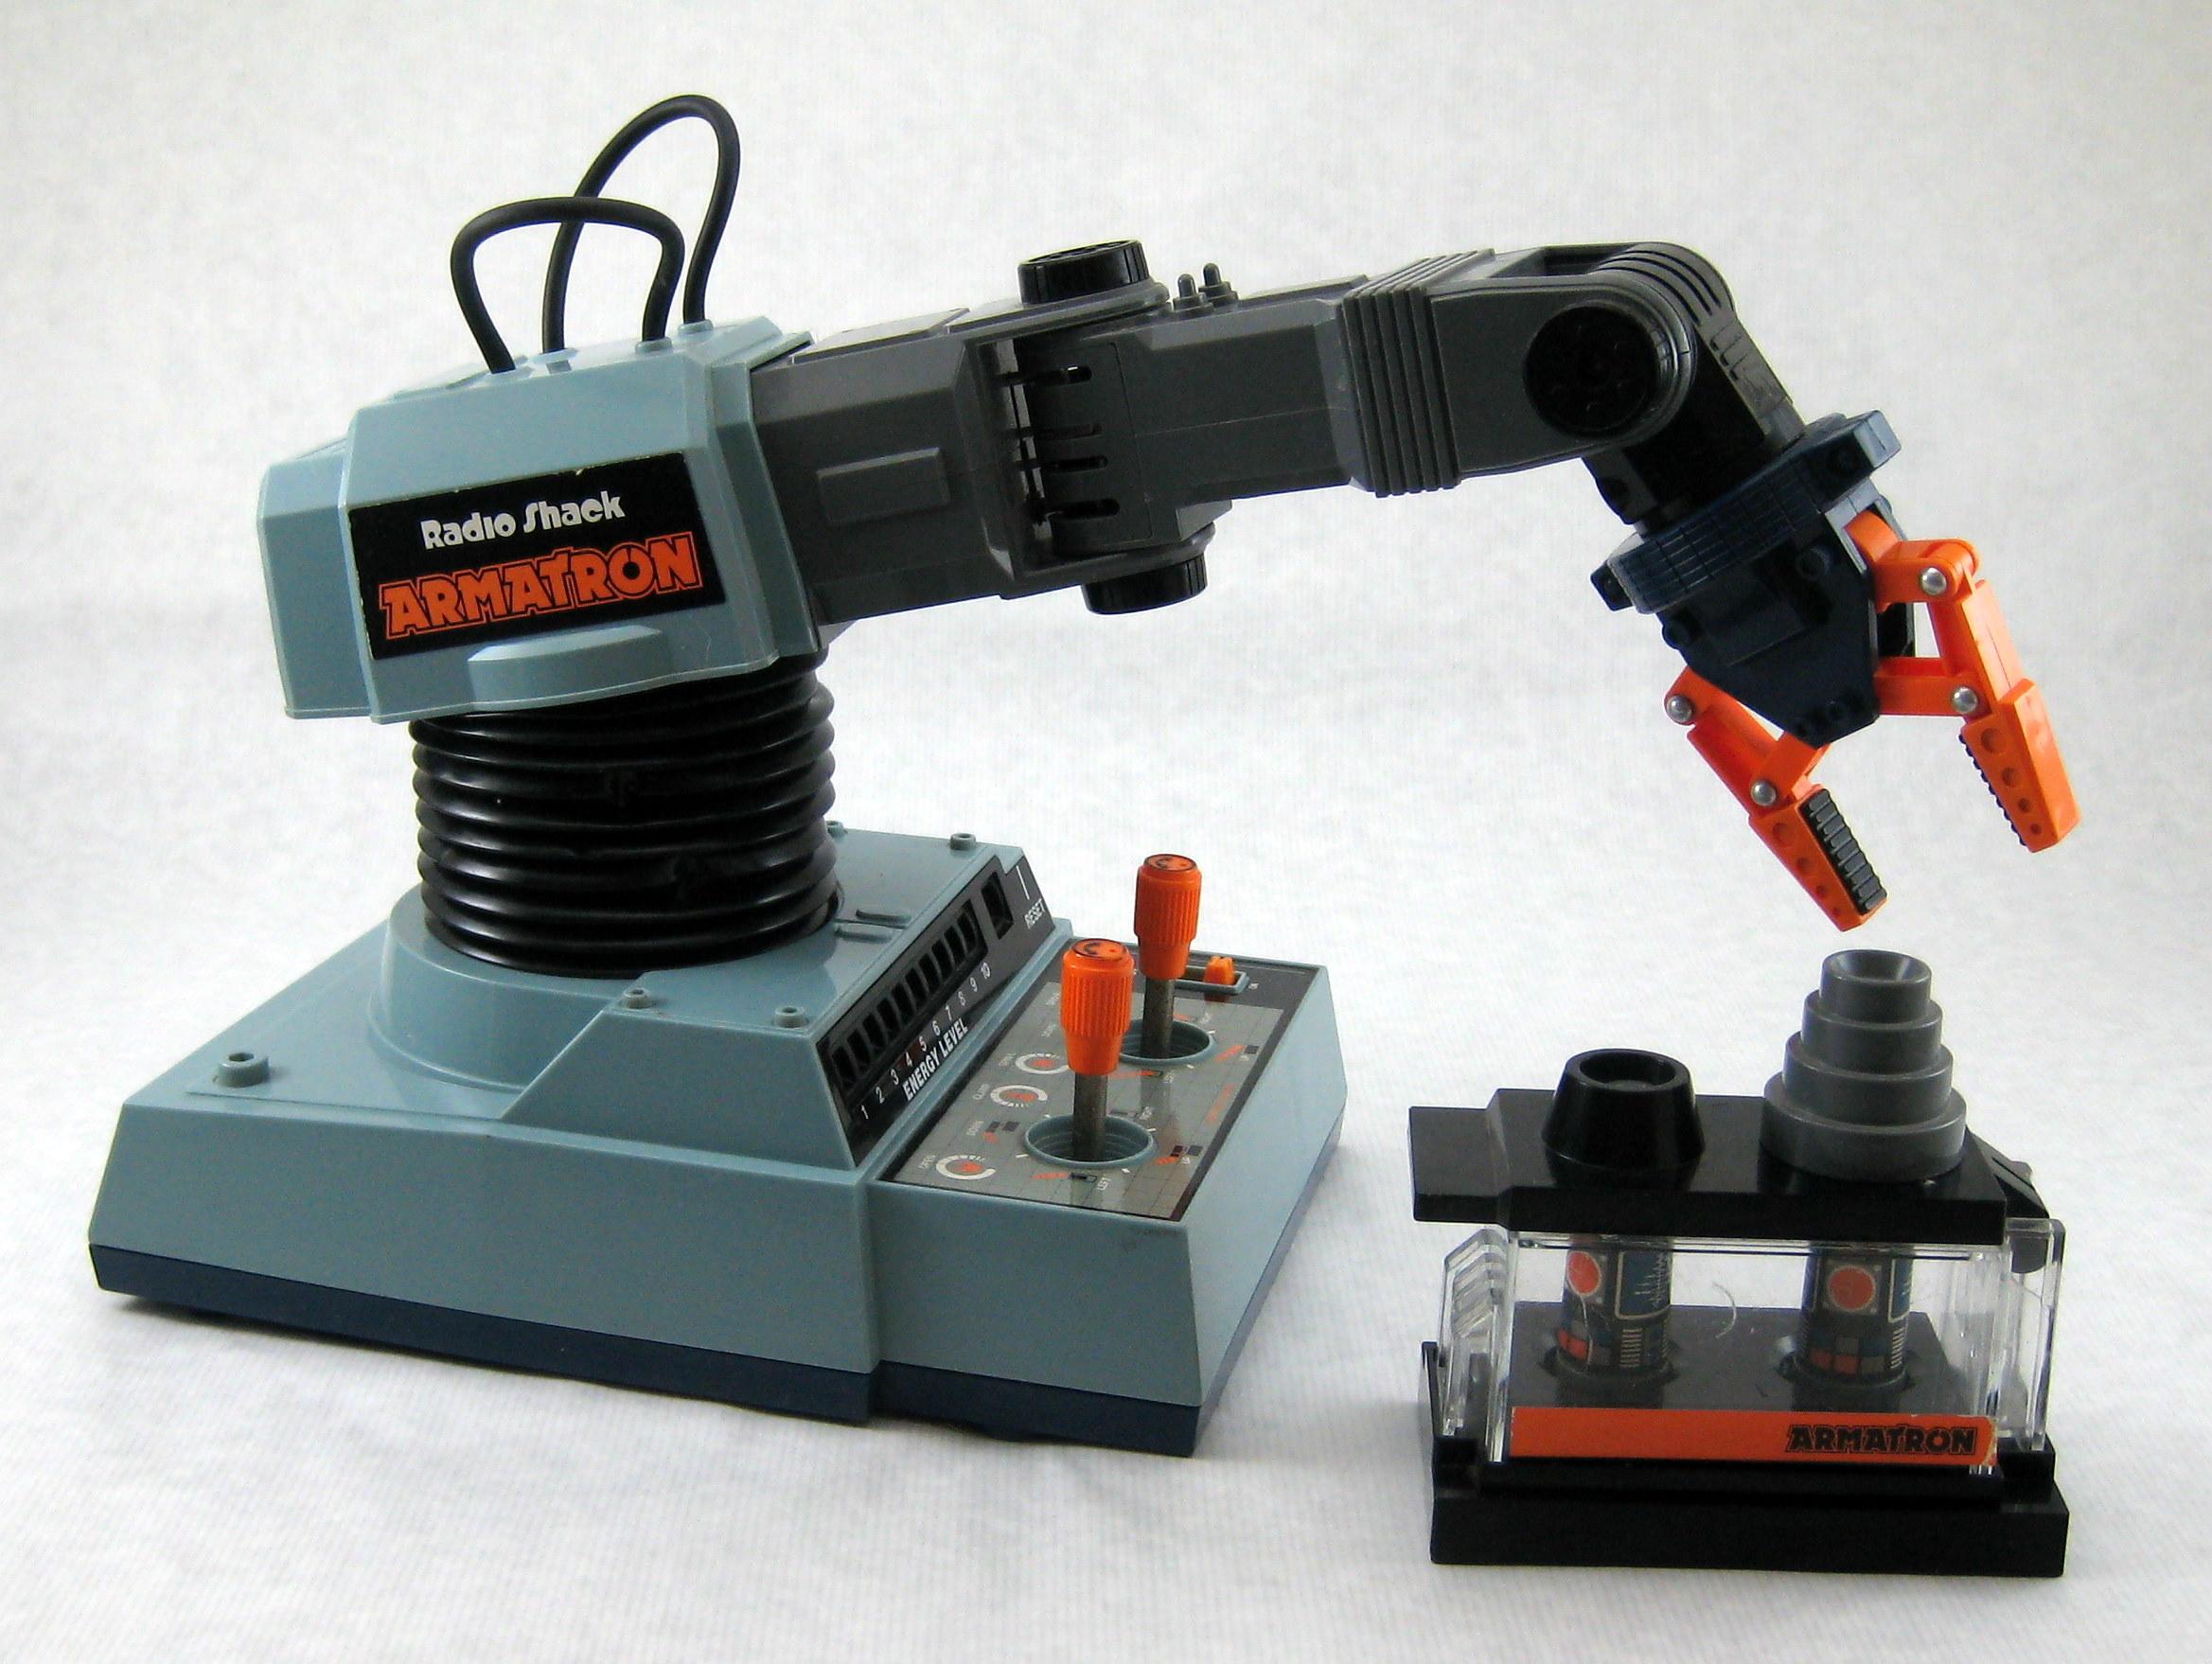 Radio Shack Armatron